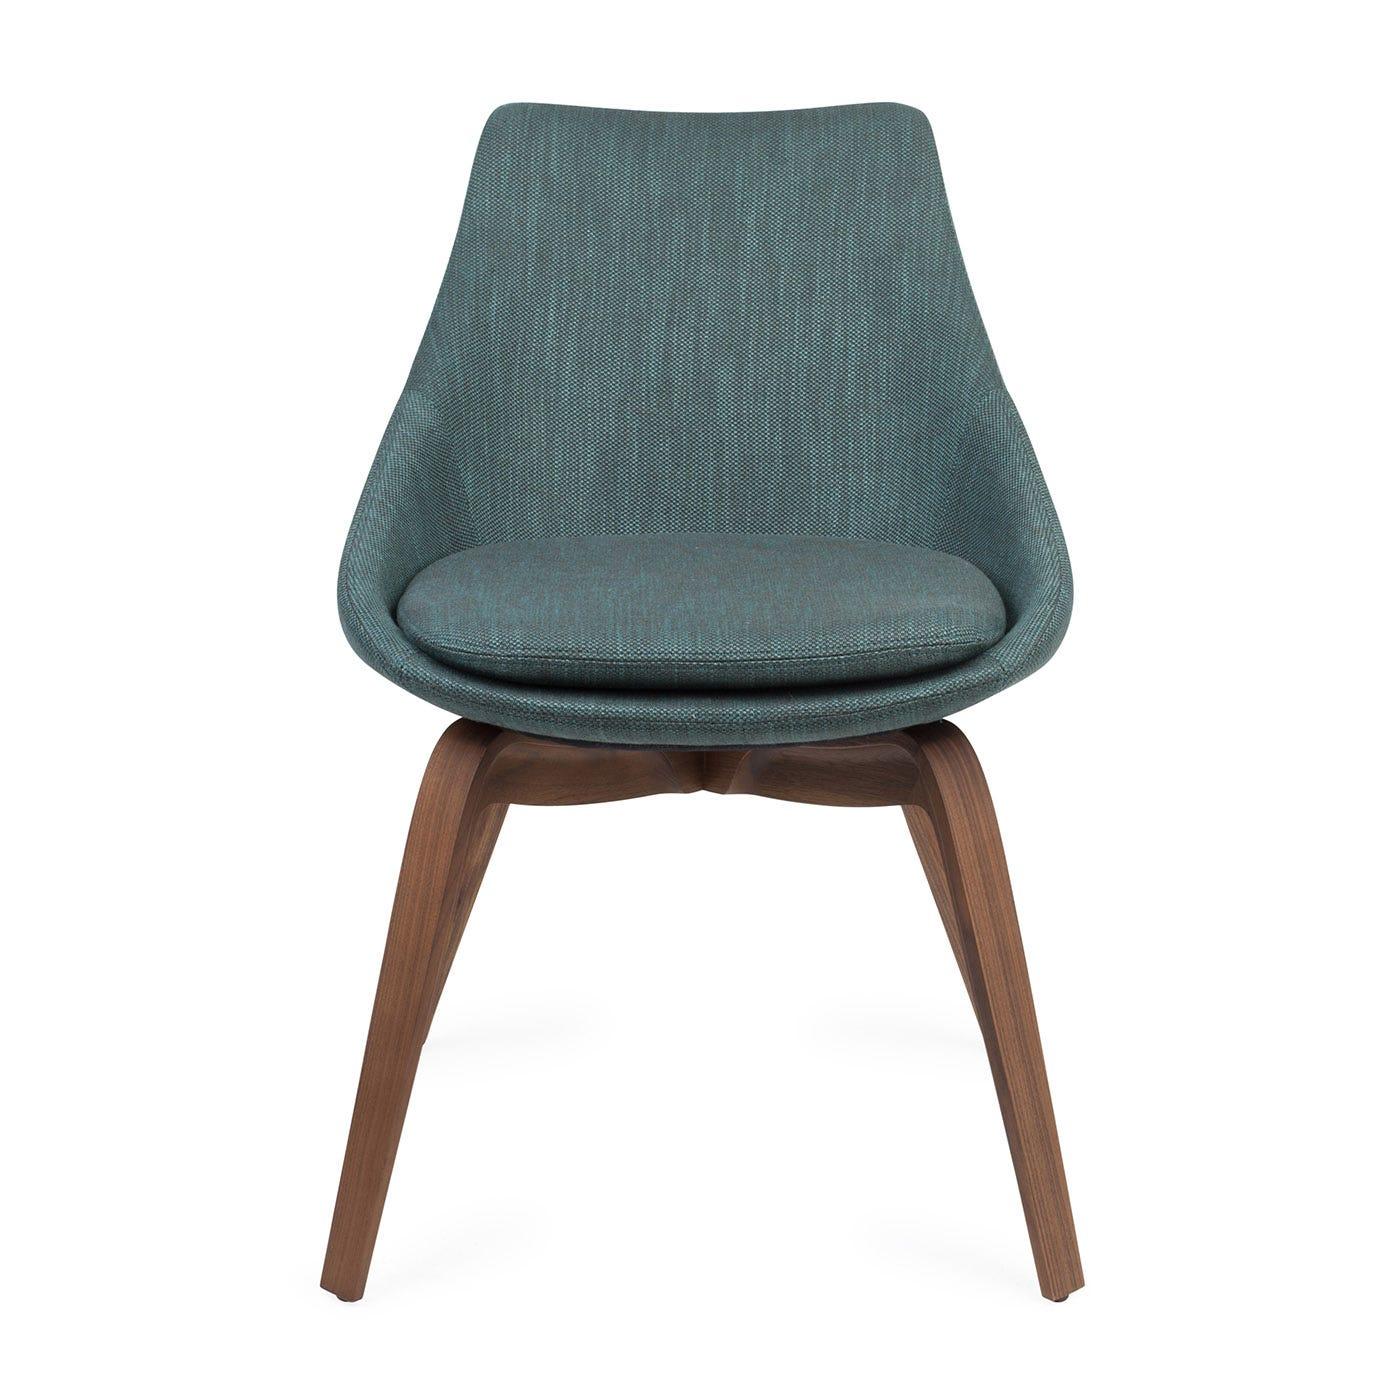 Porada Penelope Chair Walnut Dorian 27